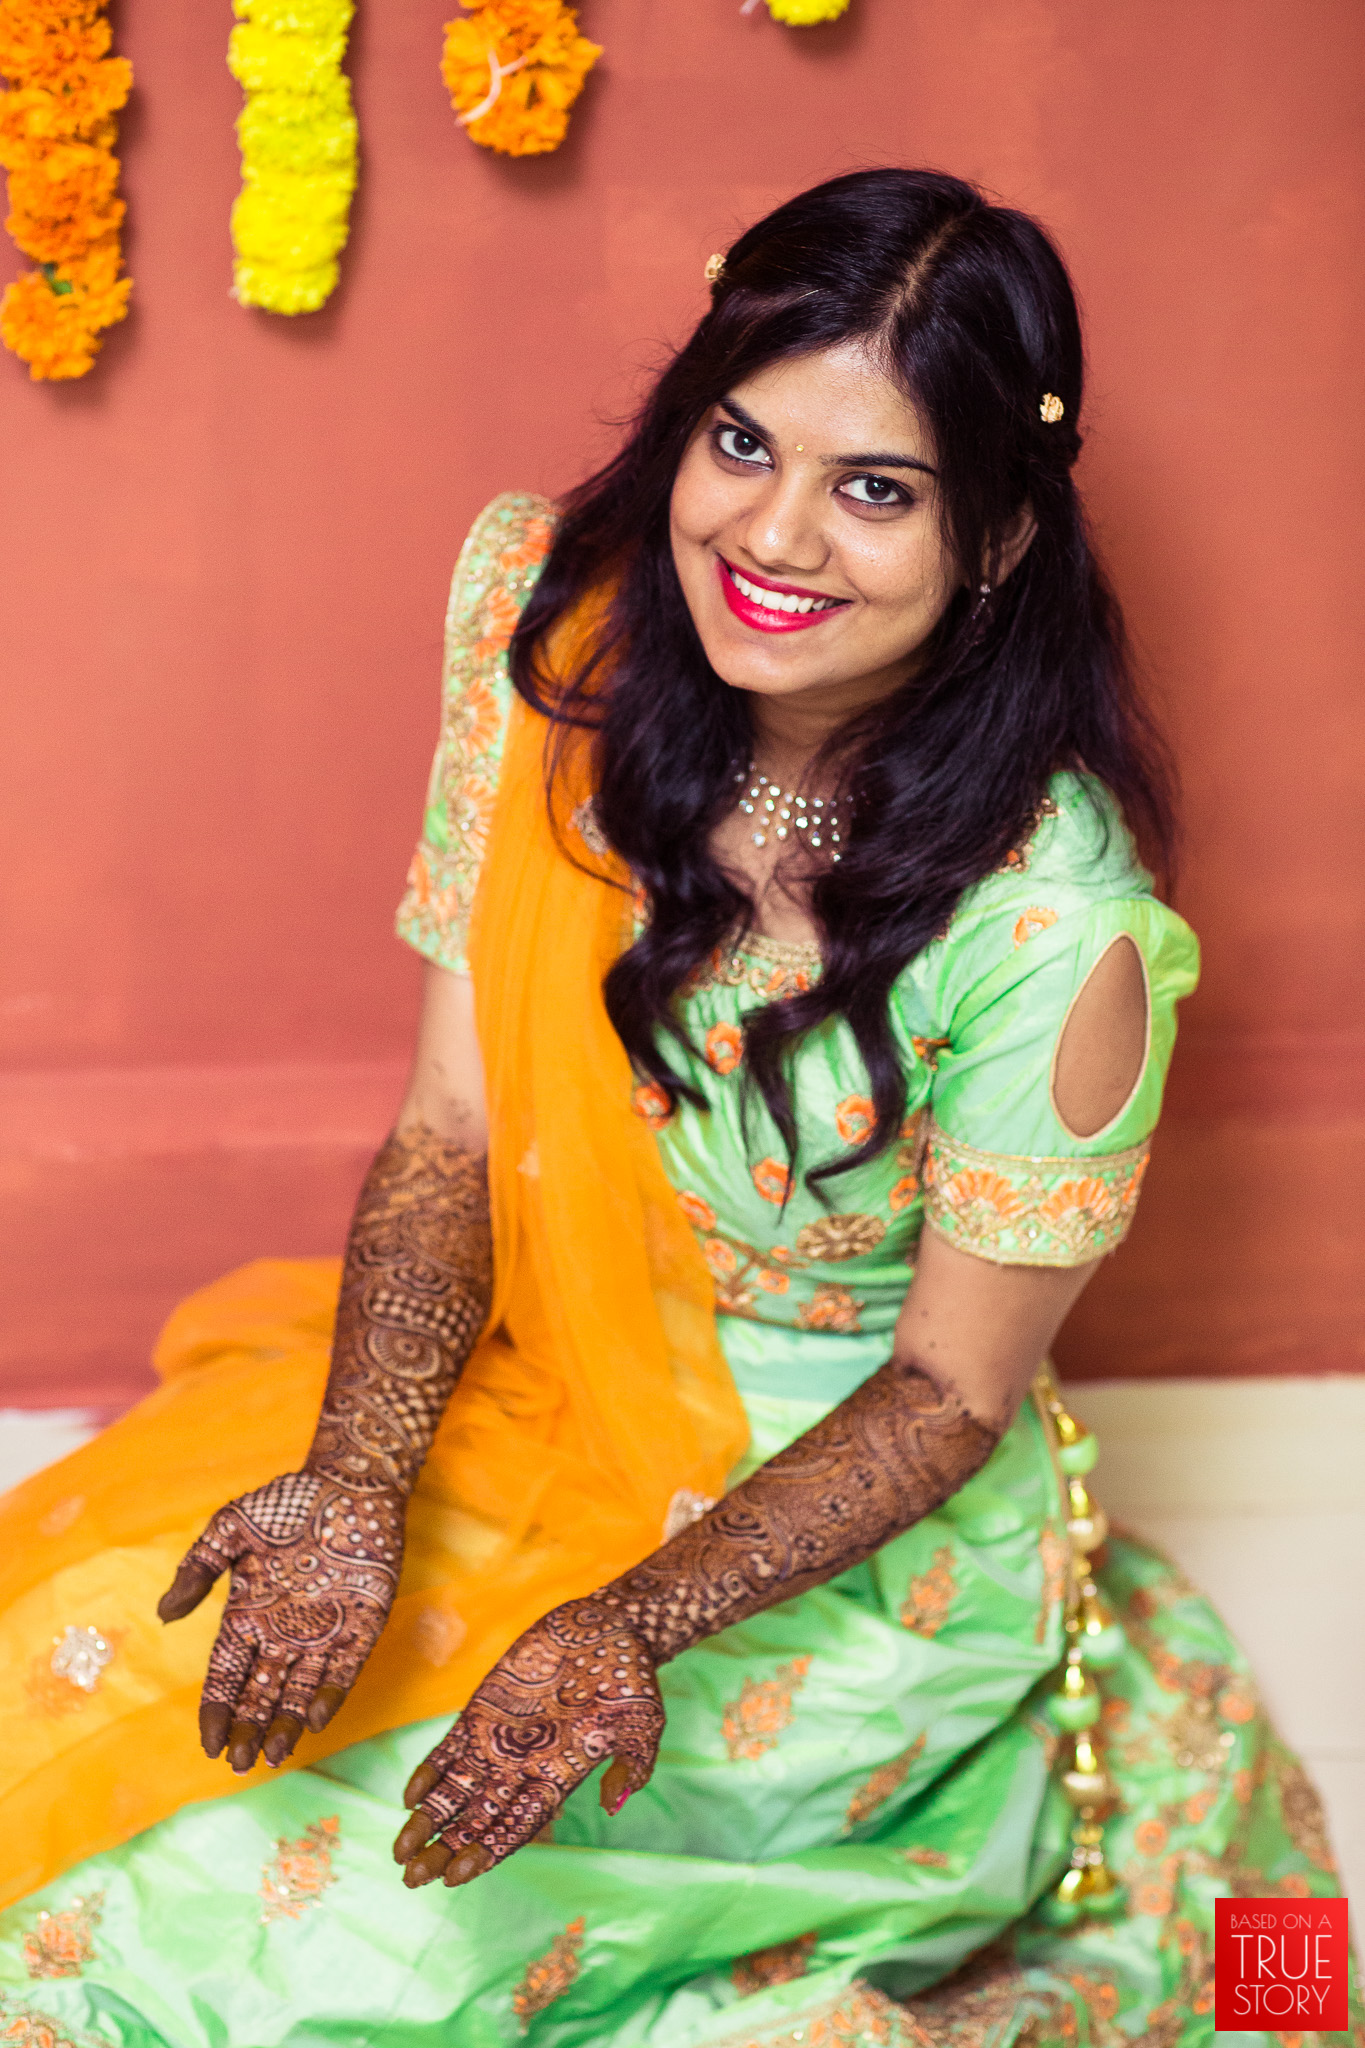 SanjithaVivekLowRes-0027.jpg